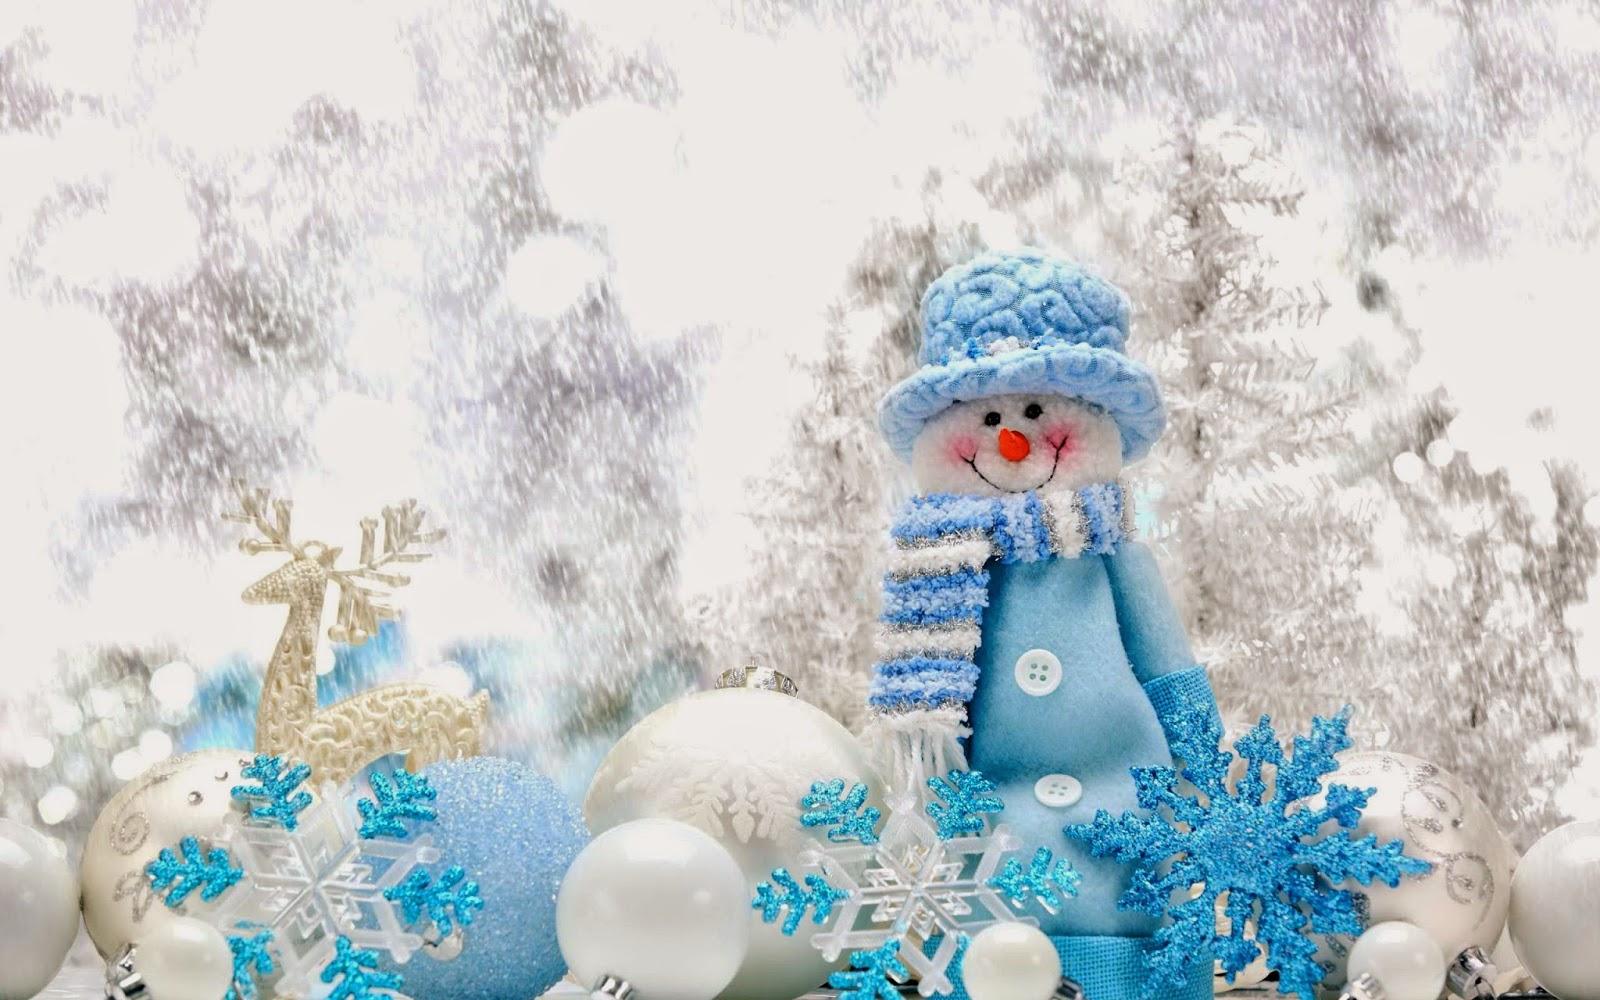 Cute-smile-snowman-blue-dress-snow-background-HD-wallpaper-for-desktop-pc-Mac.jpg